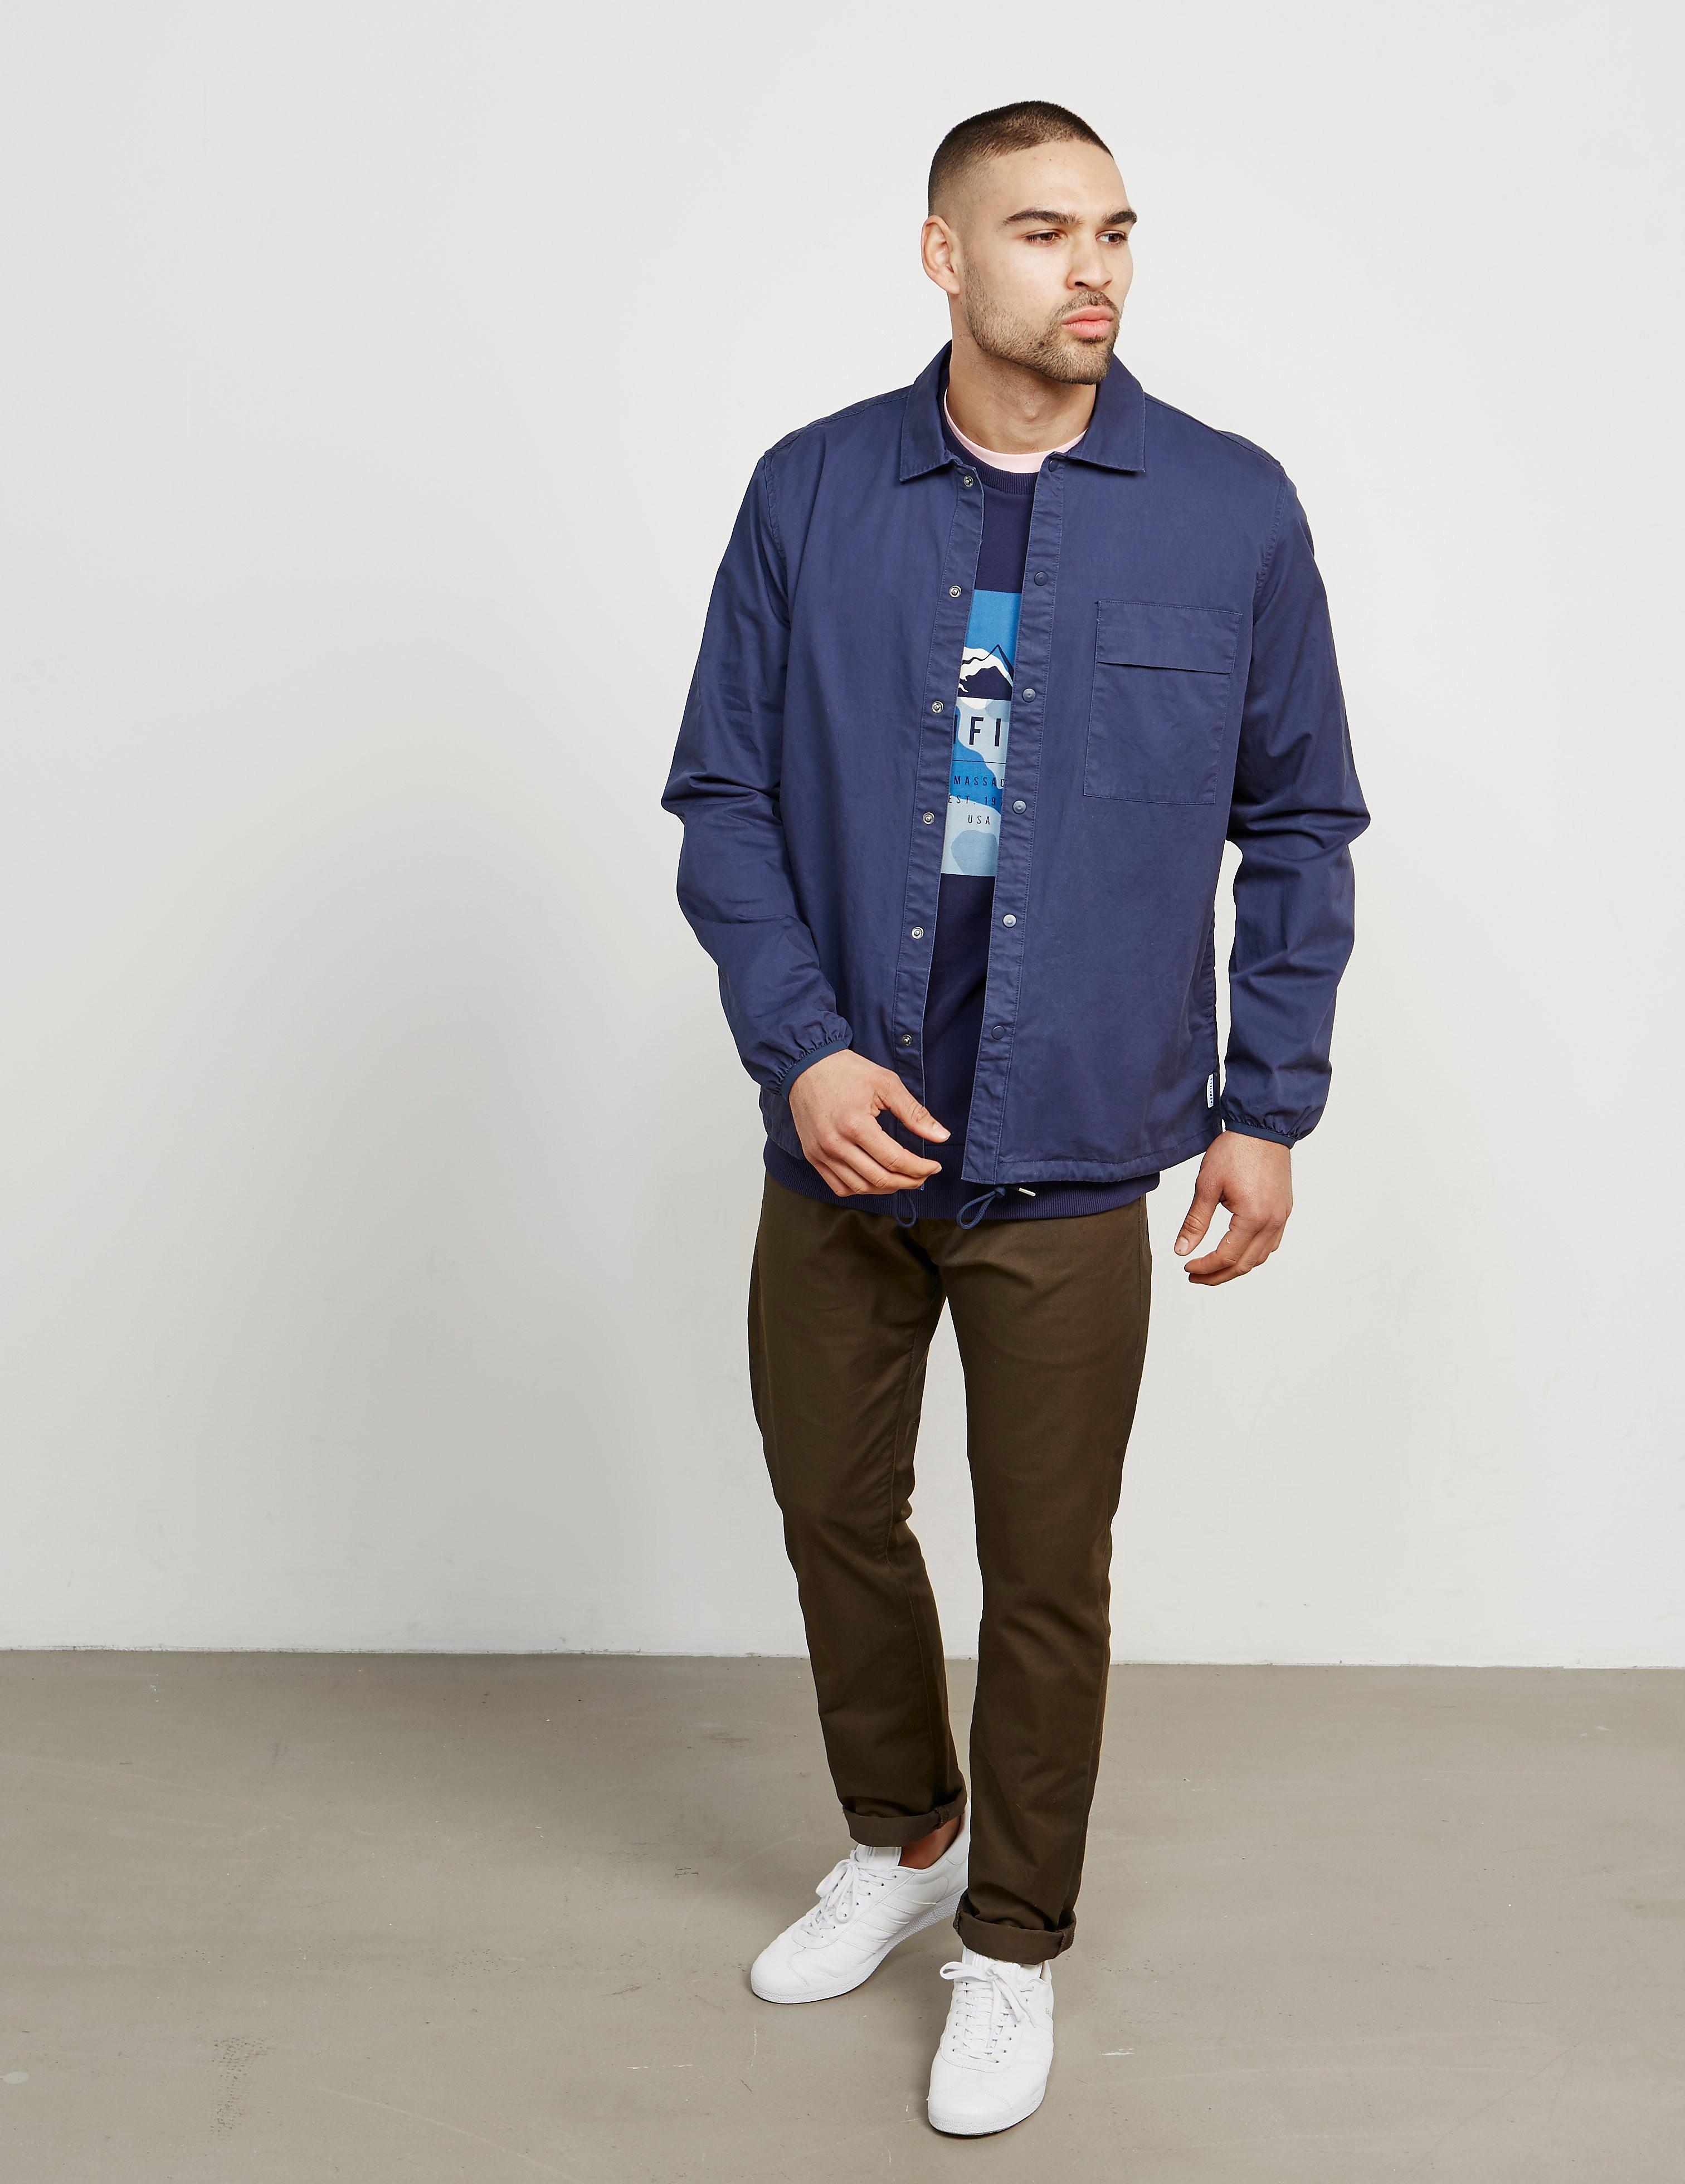 Penfield Blackstone Long Sleeve Overshirt